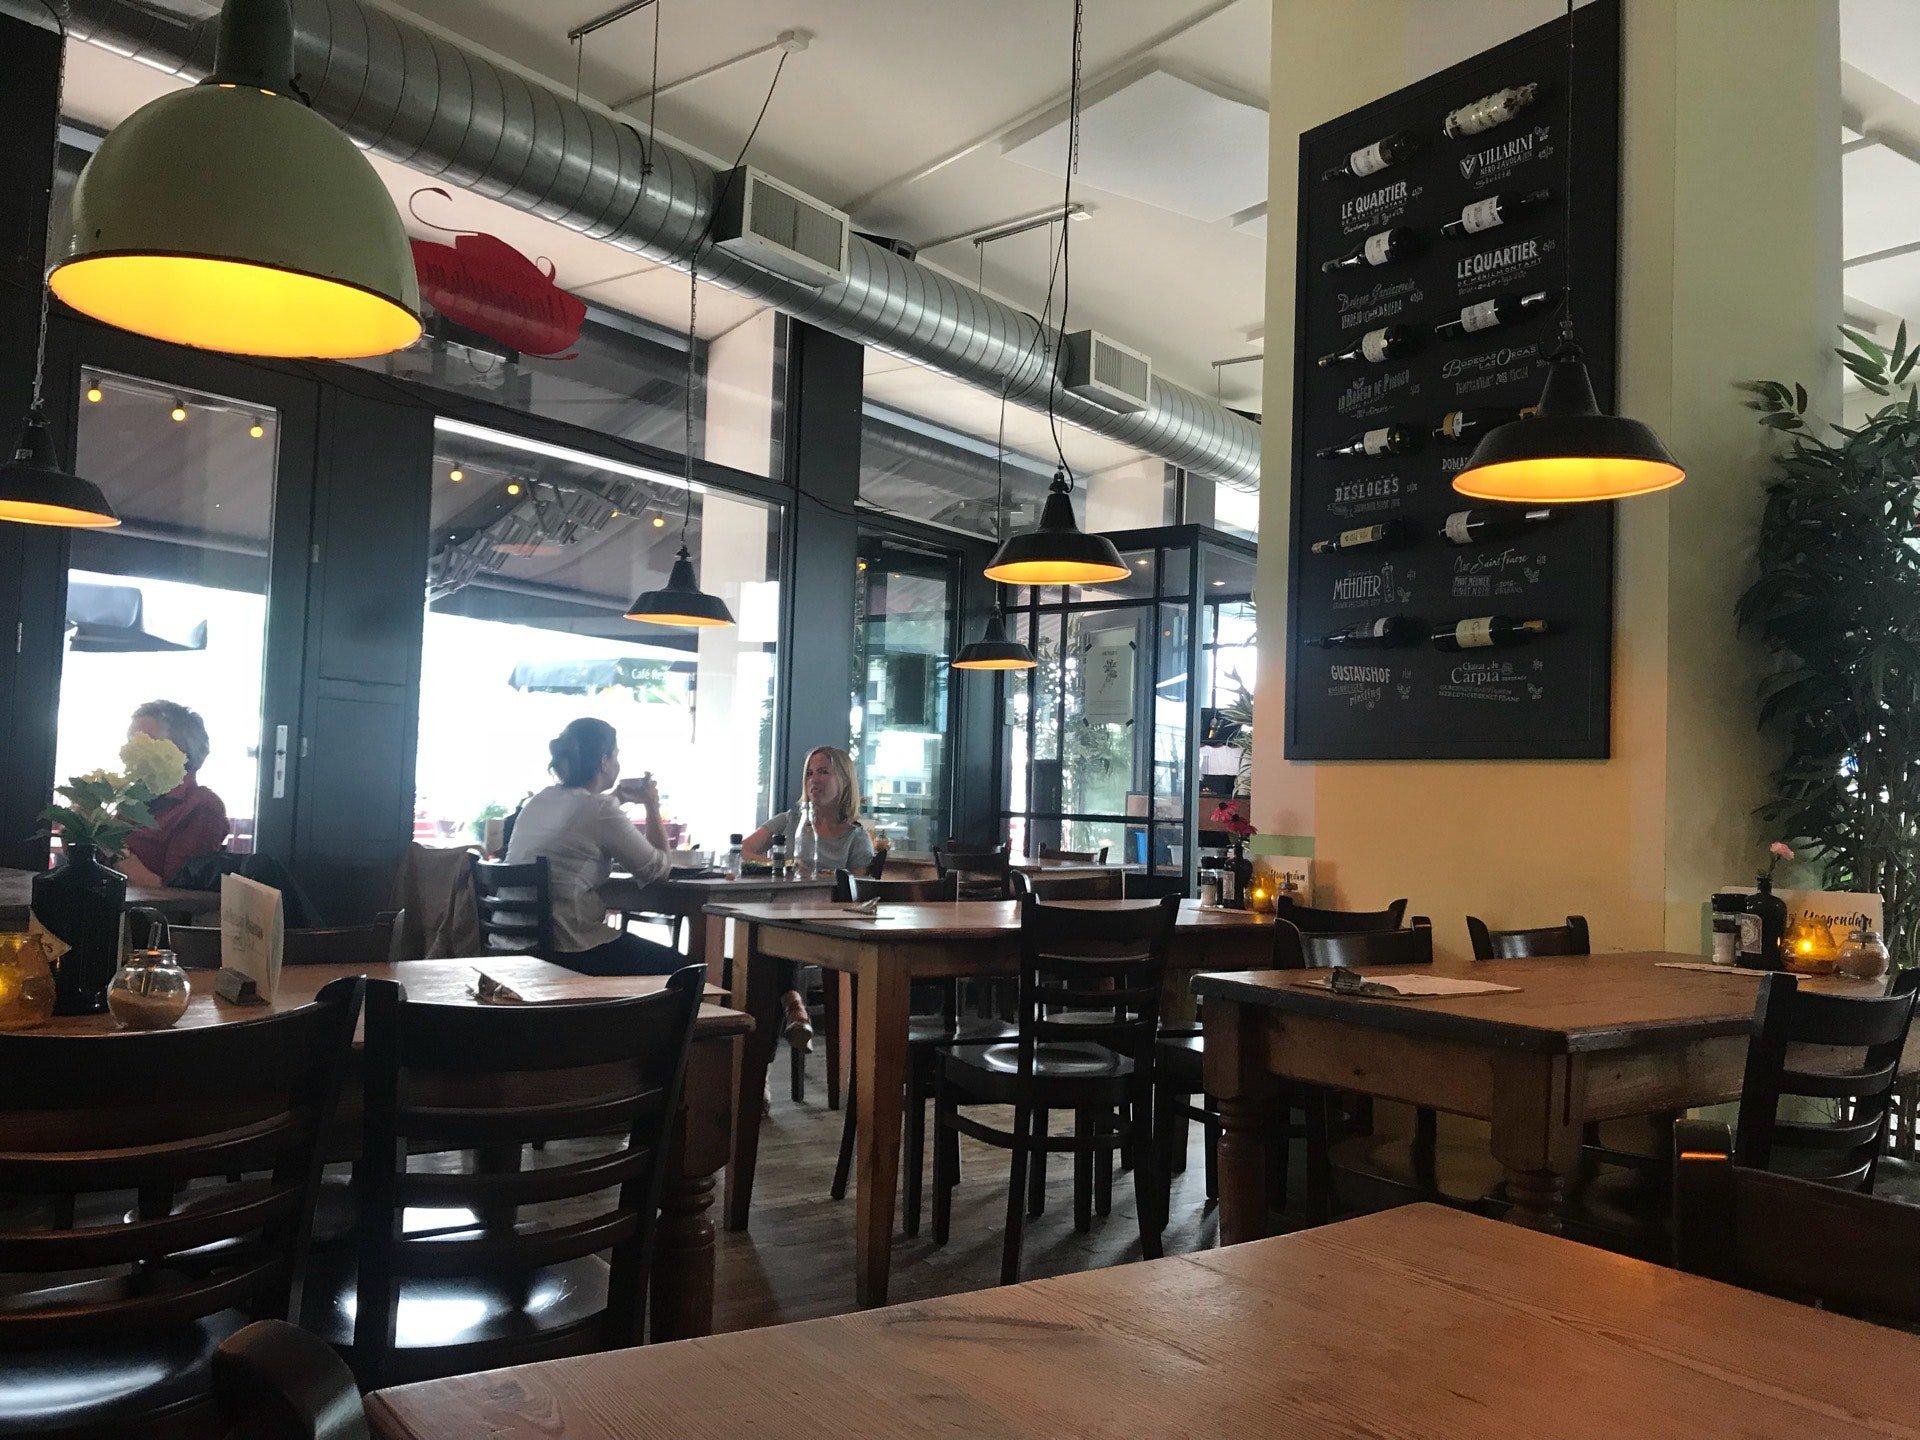 Kishau Smith Rogers On Twitter Im At Caf Restaurant Hoogendam